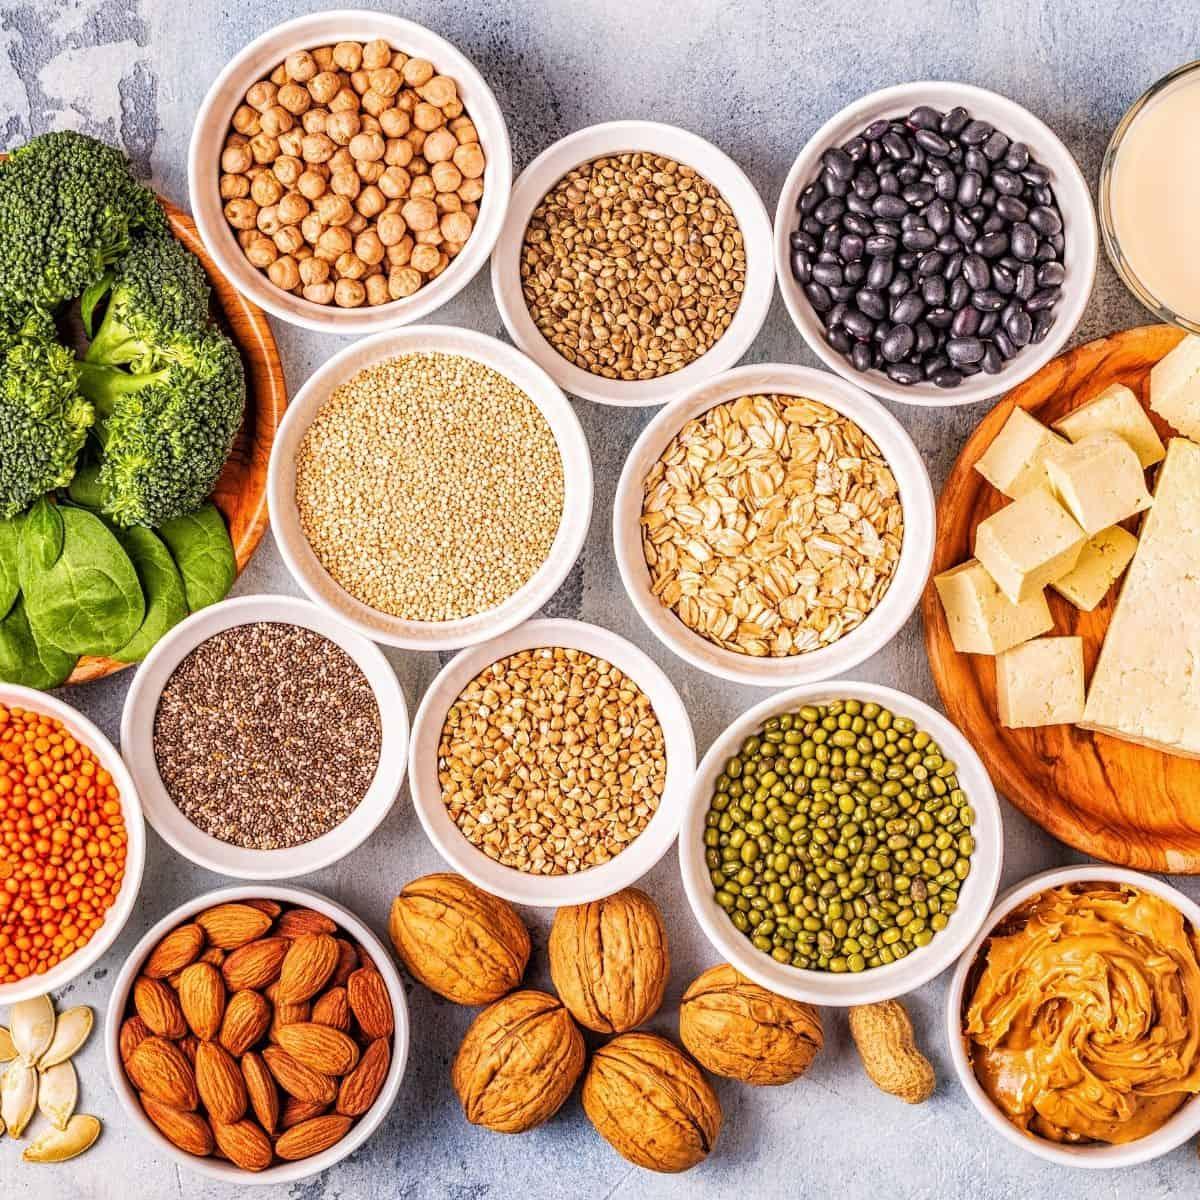 foods for a vegan diet.